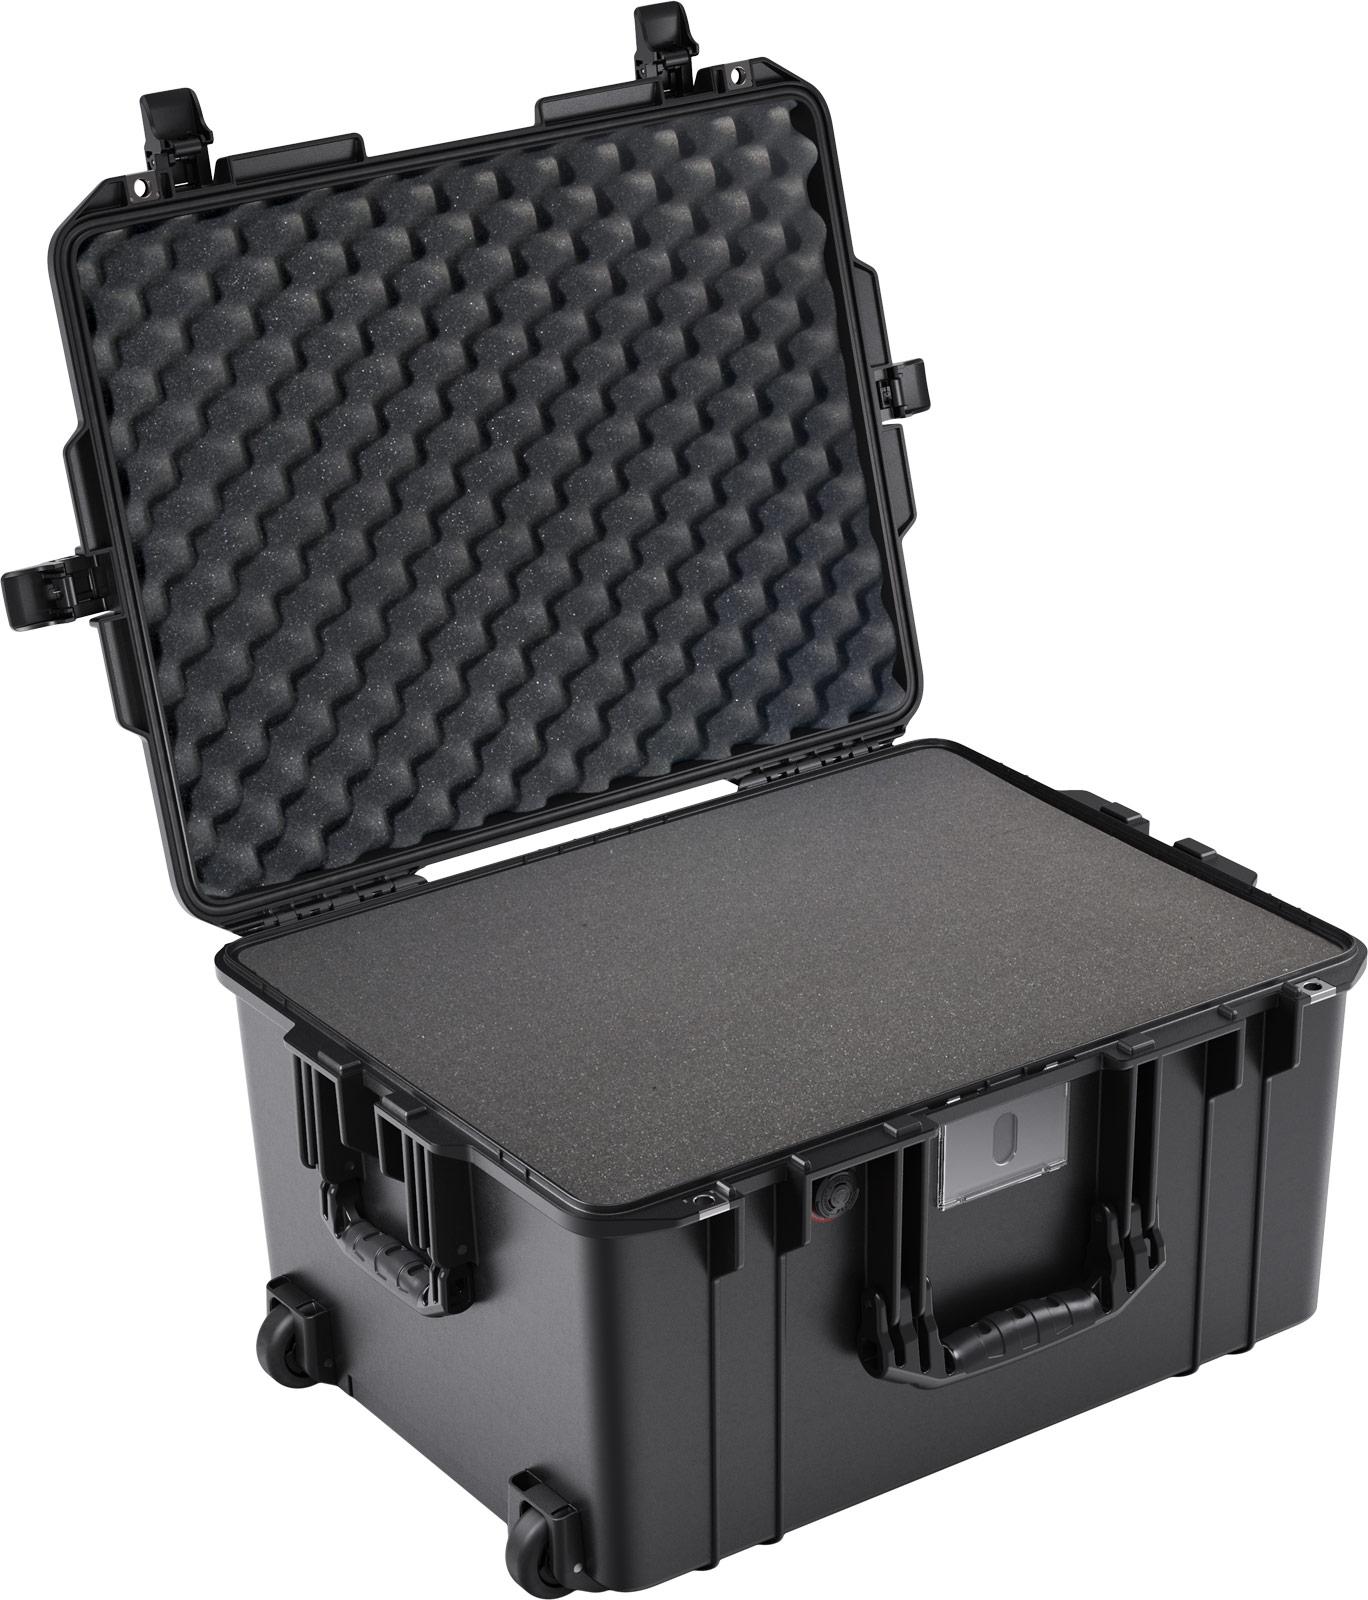 pelican air case travel drone cases 1607